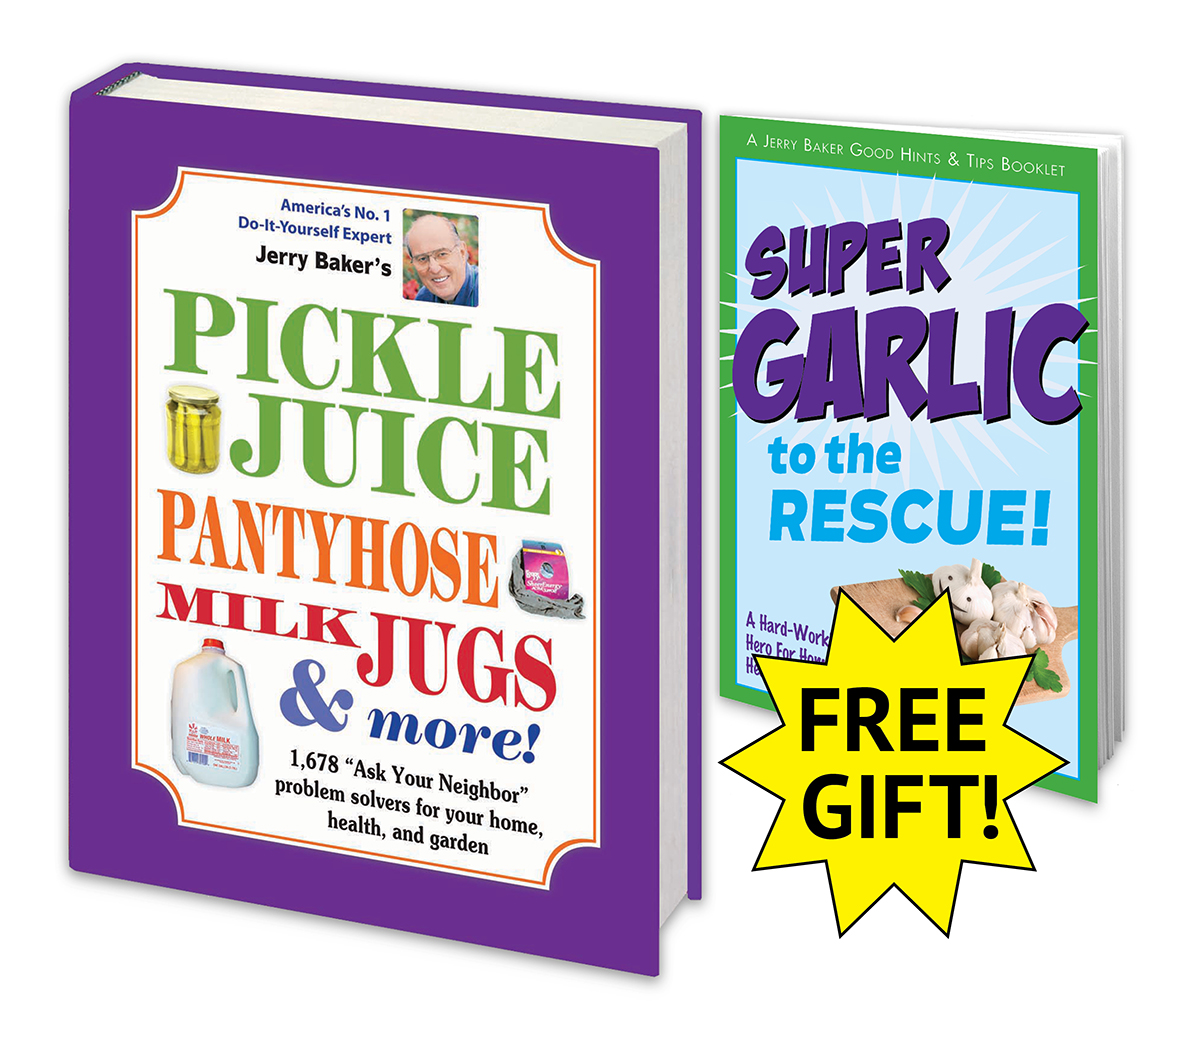 Pickle Juice, Pantyhose, & Milk Jugs